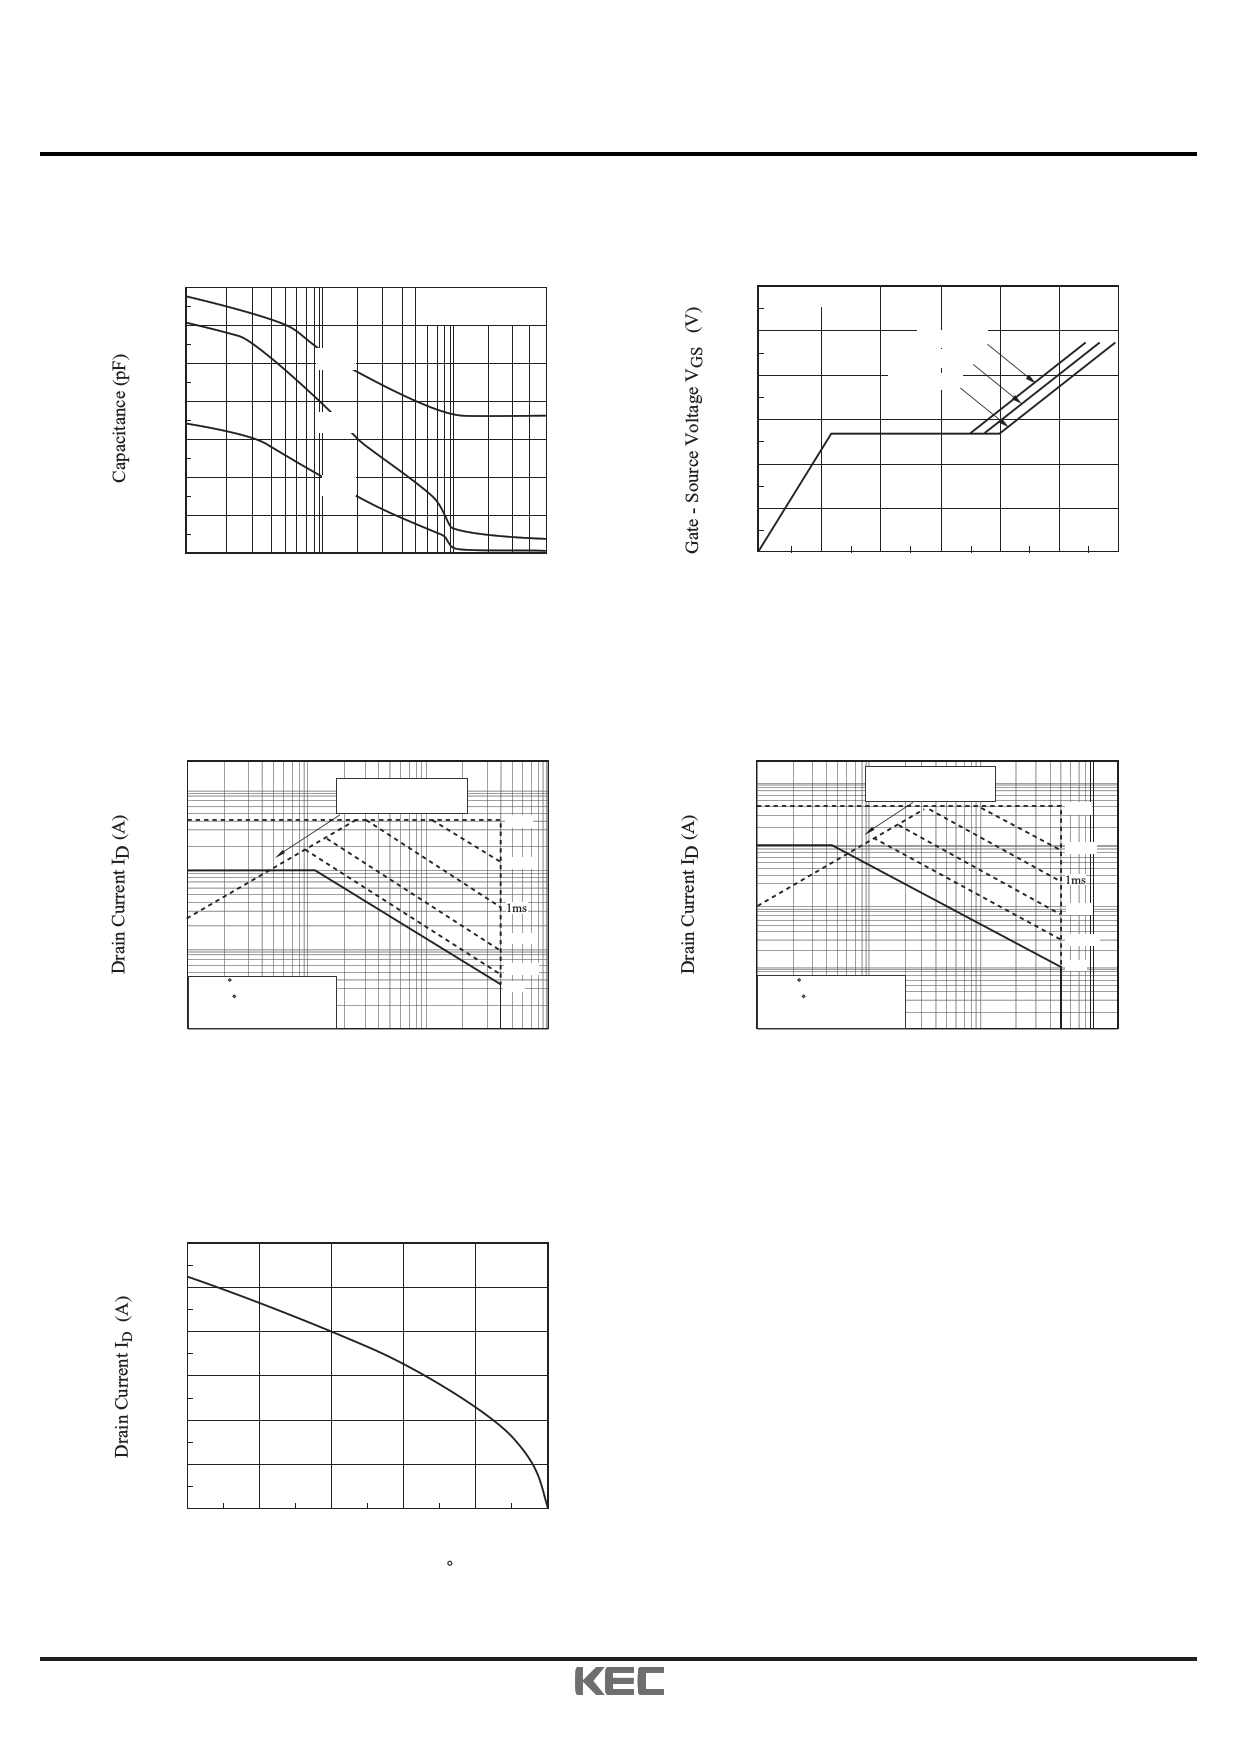 011N40P1 pdf, 반도체, 판매, 대치품